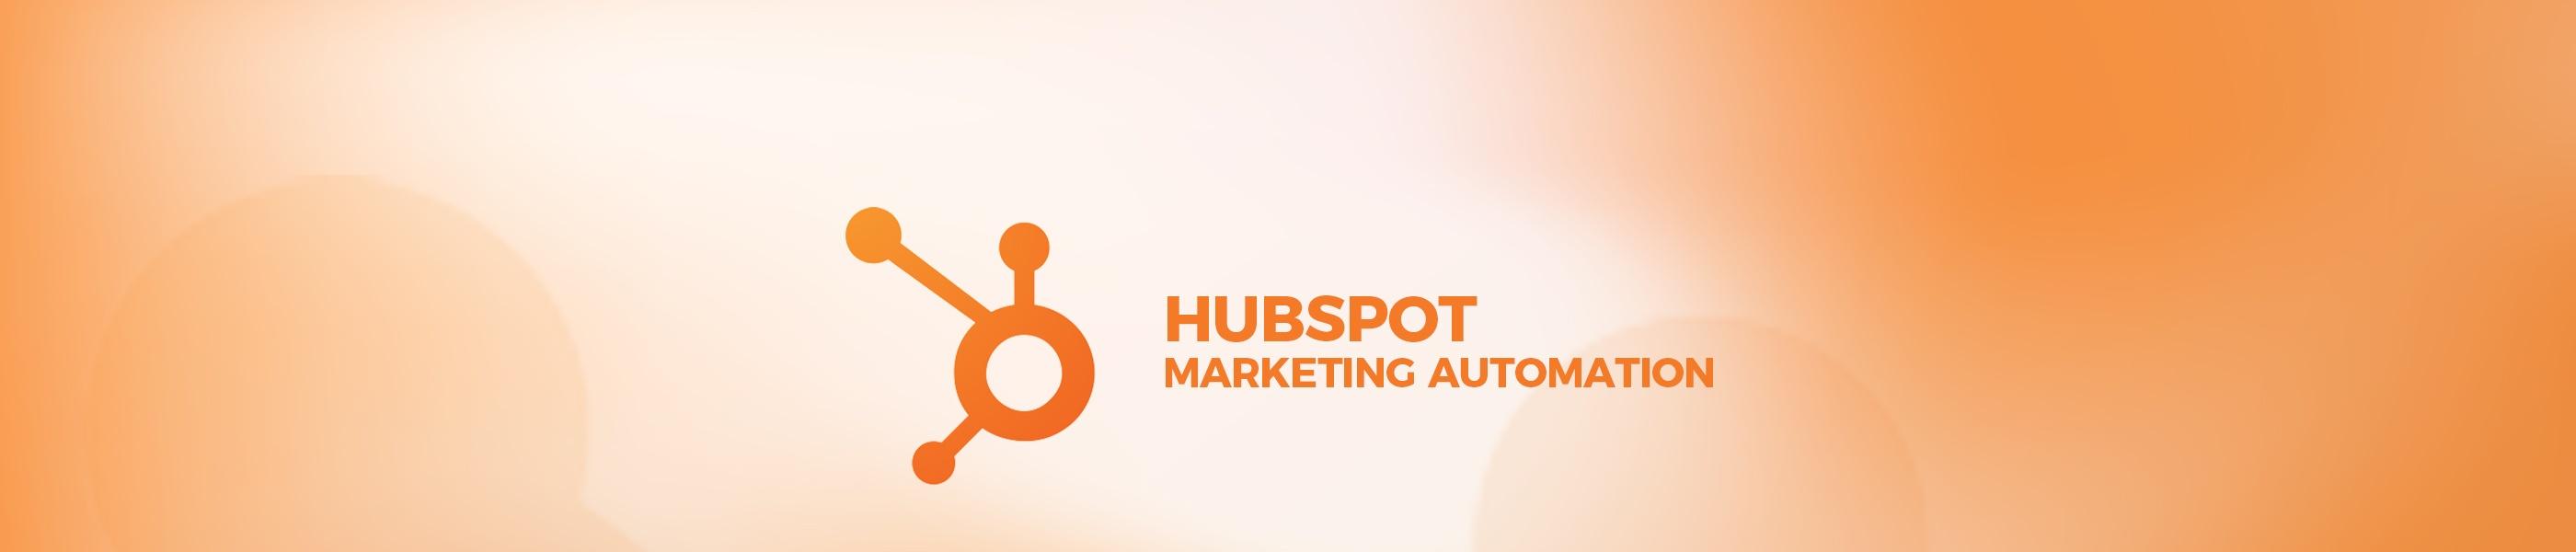 180108_Produkte_hubspot.jpg